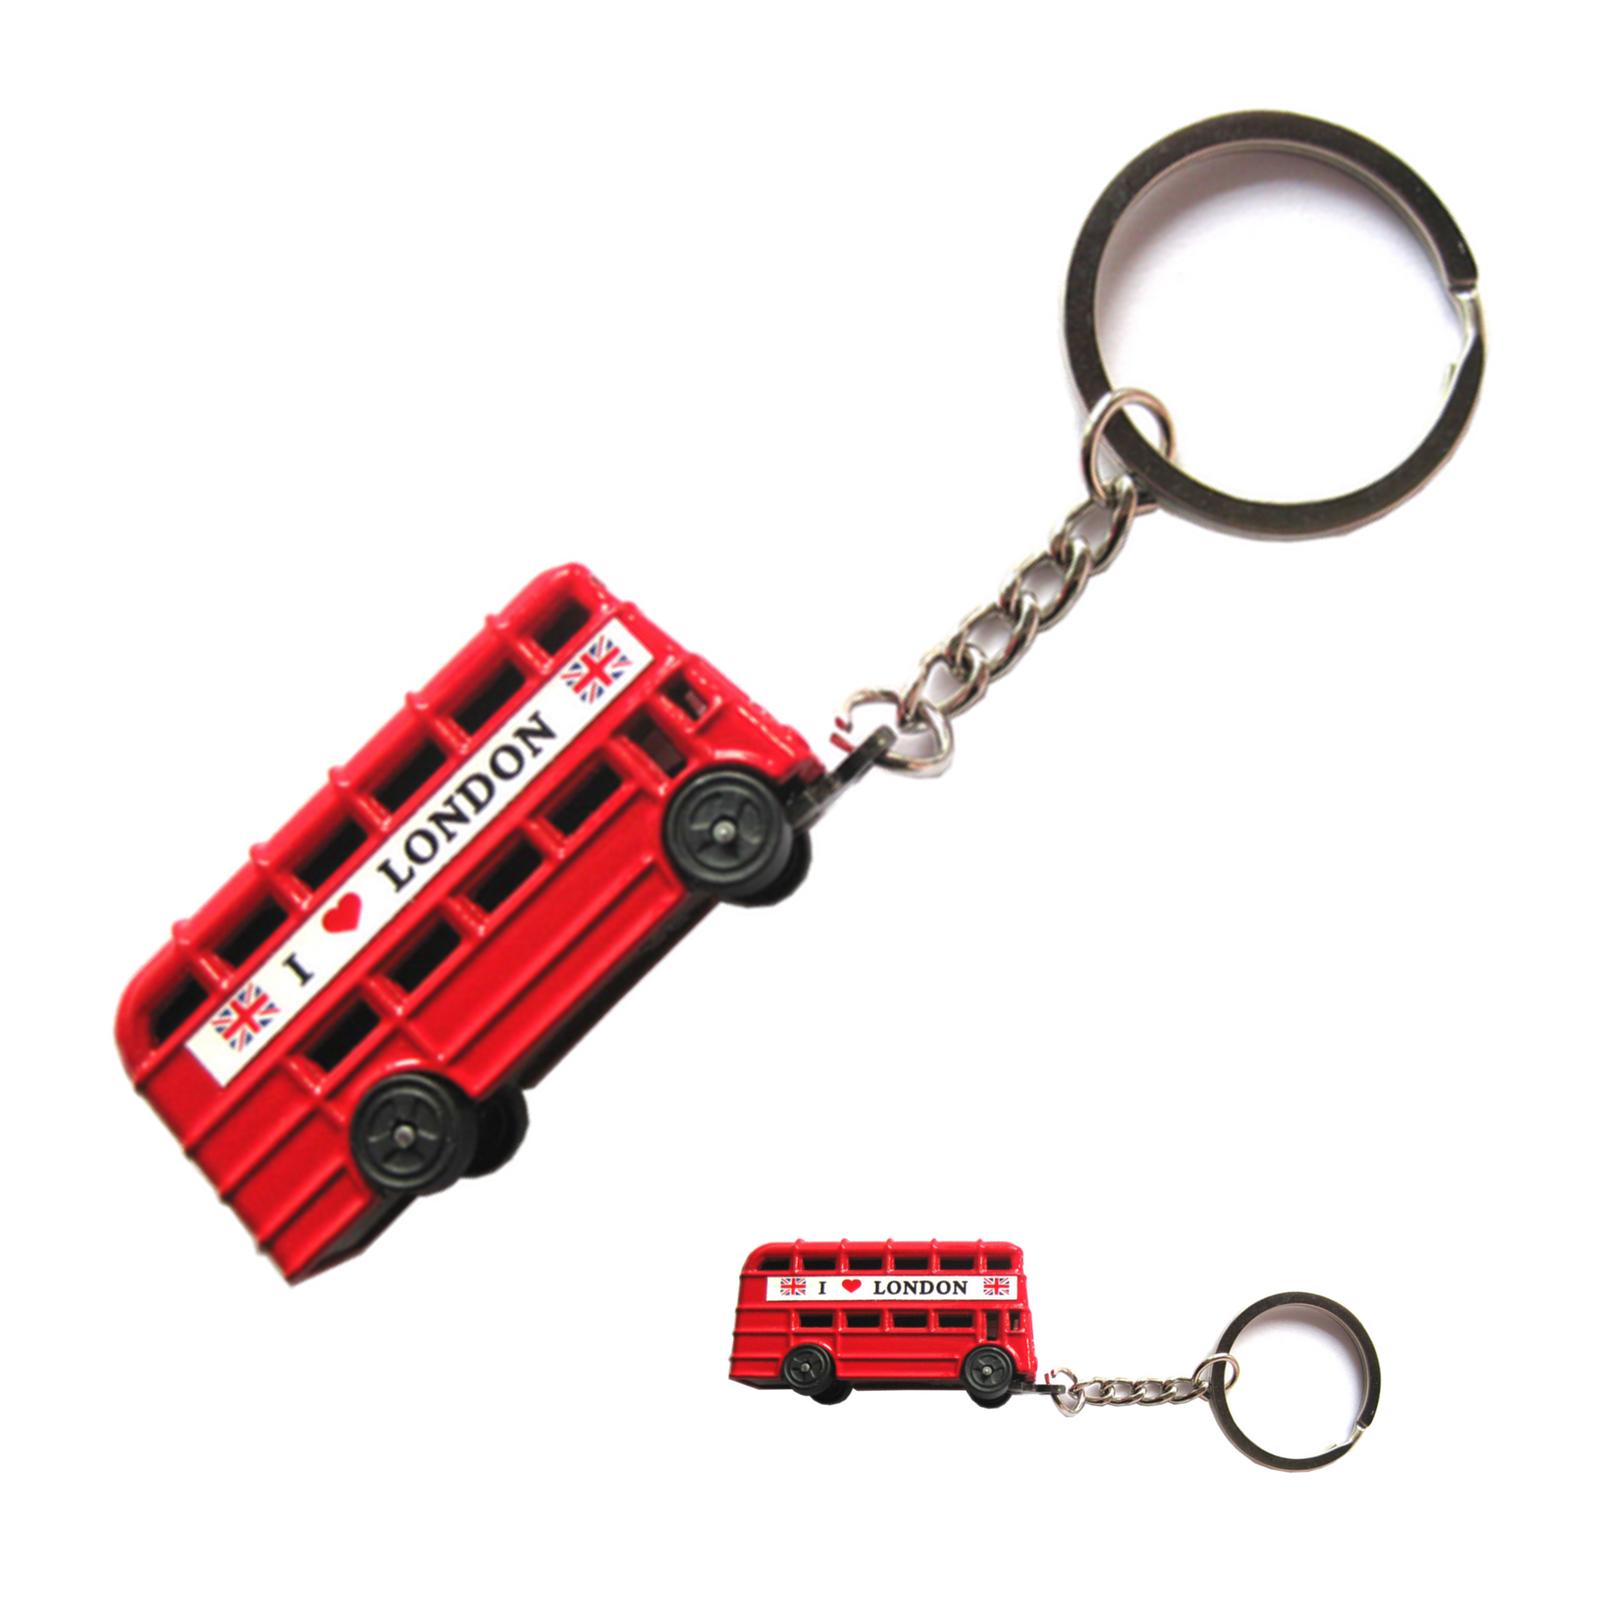 London red bus keyrings British London souvenirs key chains Union jack England key holders